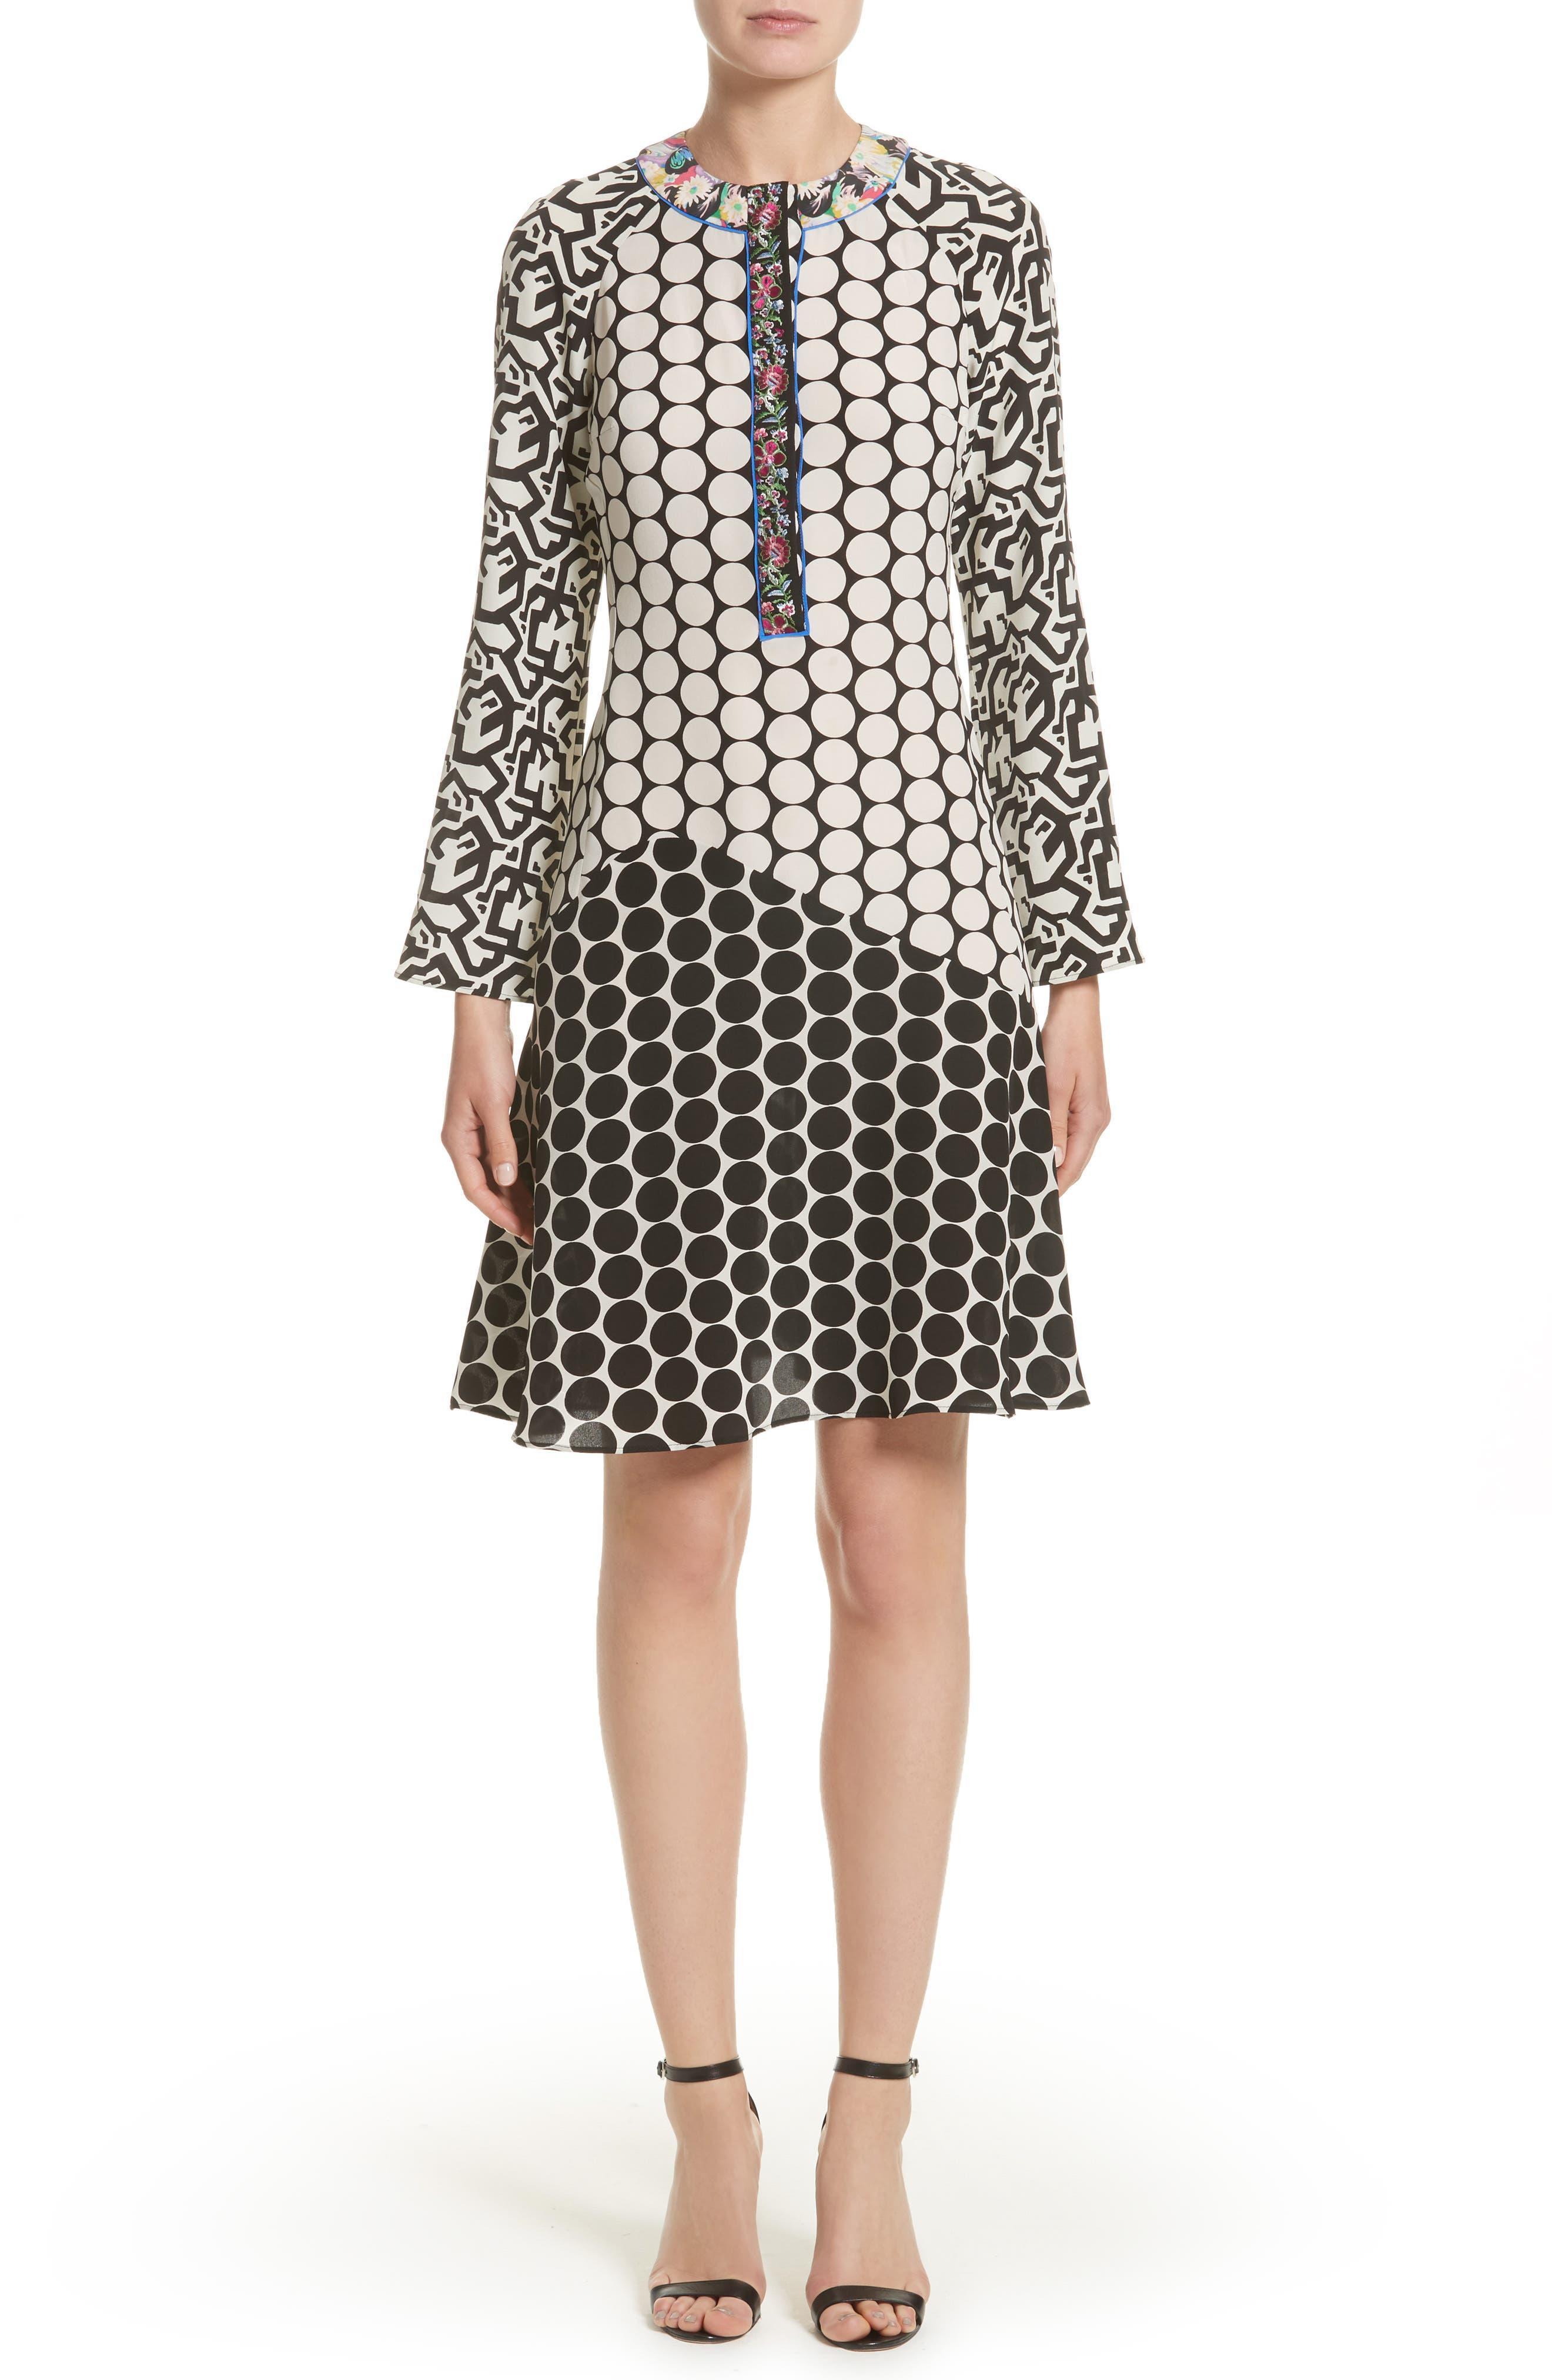 Etro Polka Dot Print Silk Crêpe de Chine Flutter Dress